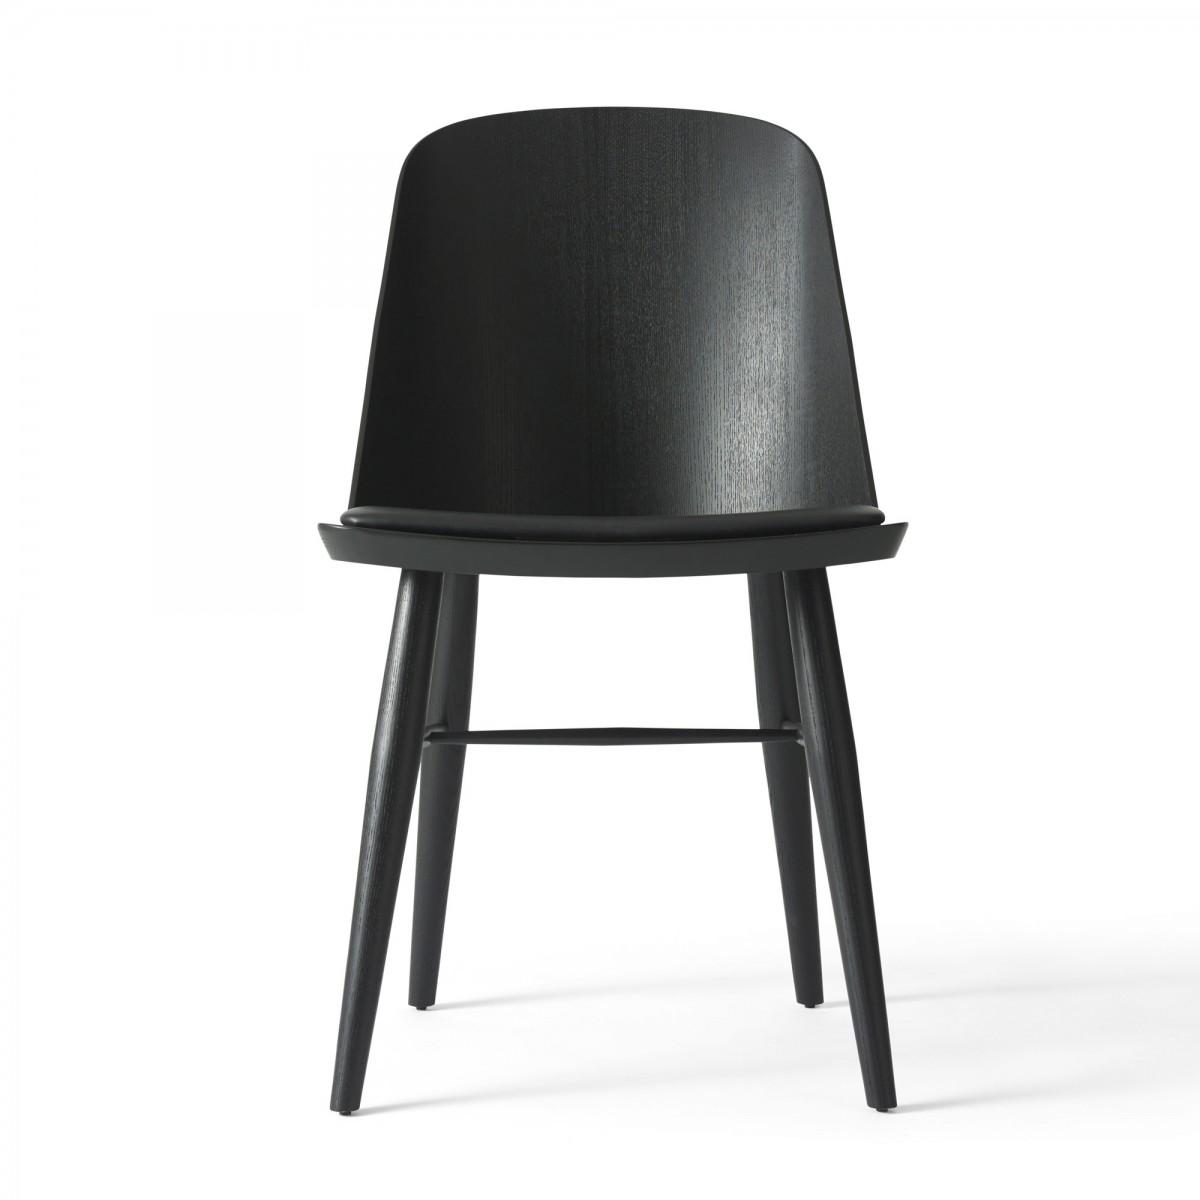 chaise synnes cuir noir et fr ne teint noir muuto. Black Bedroom Furniture Sets. Home Design Ideas